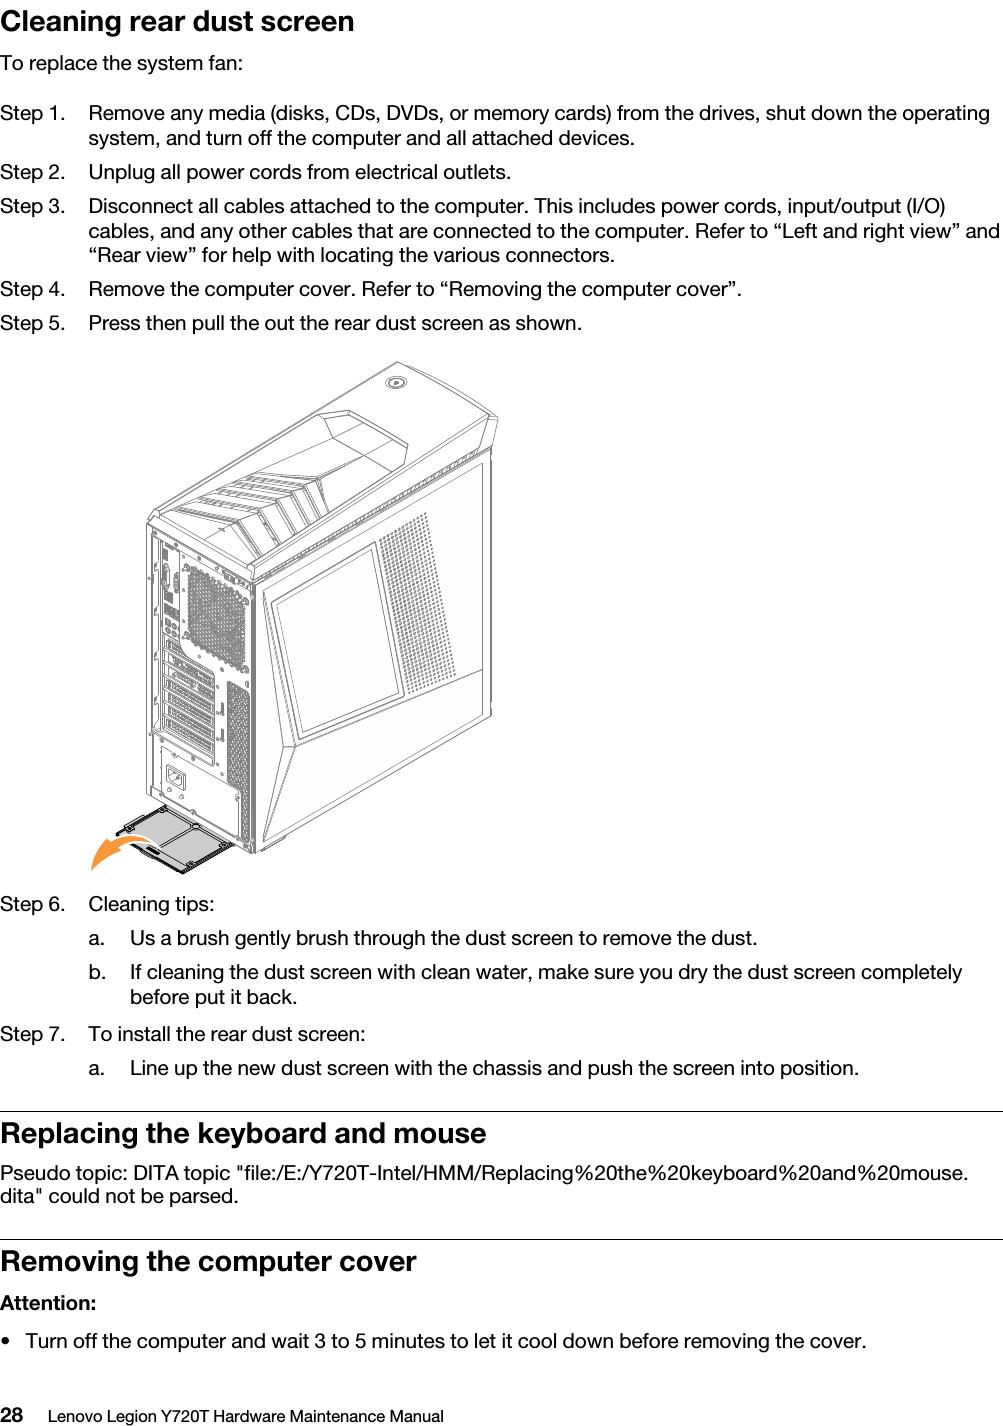 Lenovo Y720T 34Ikh Hmm 20170814 Legion Hardware Maintenance